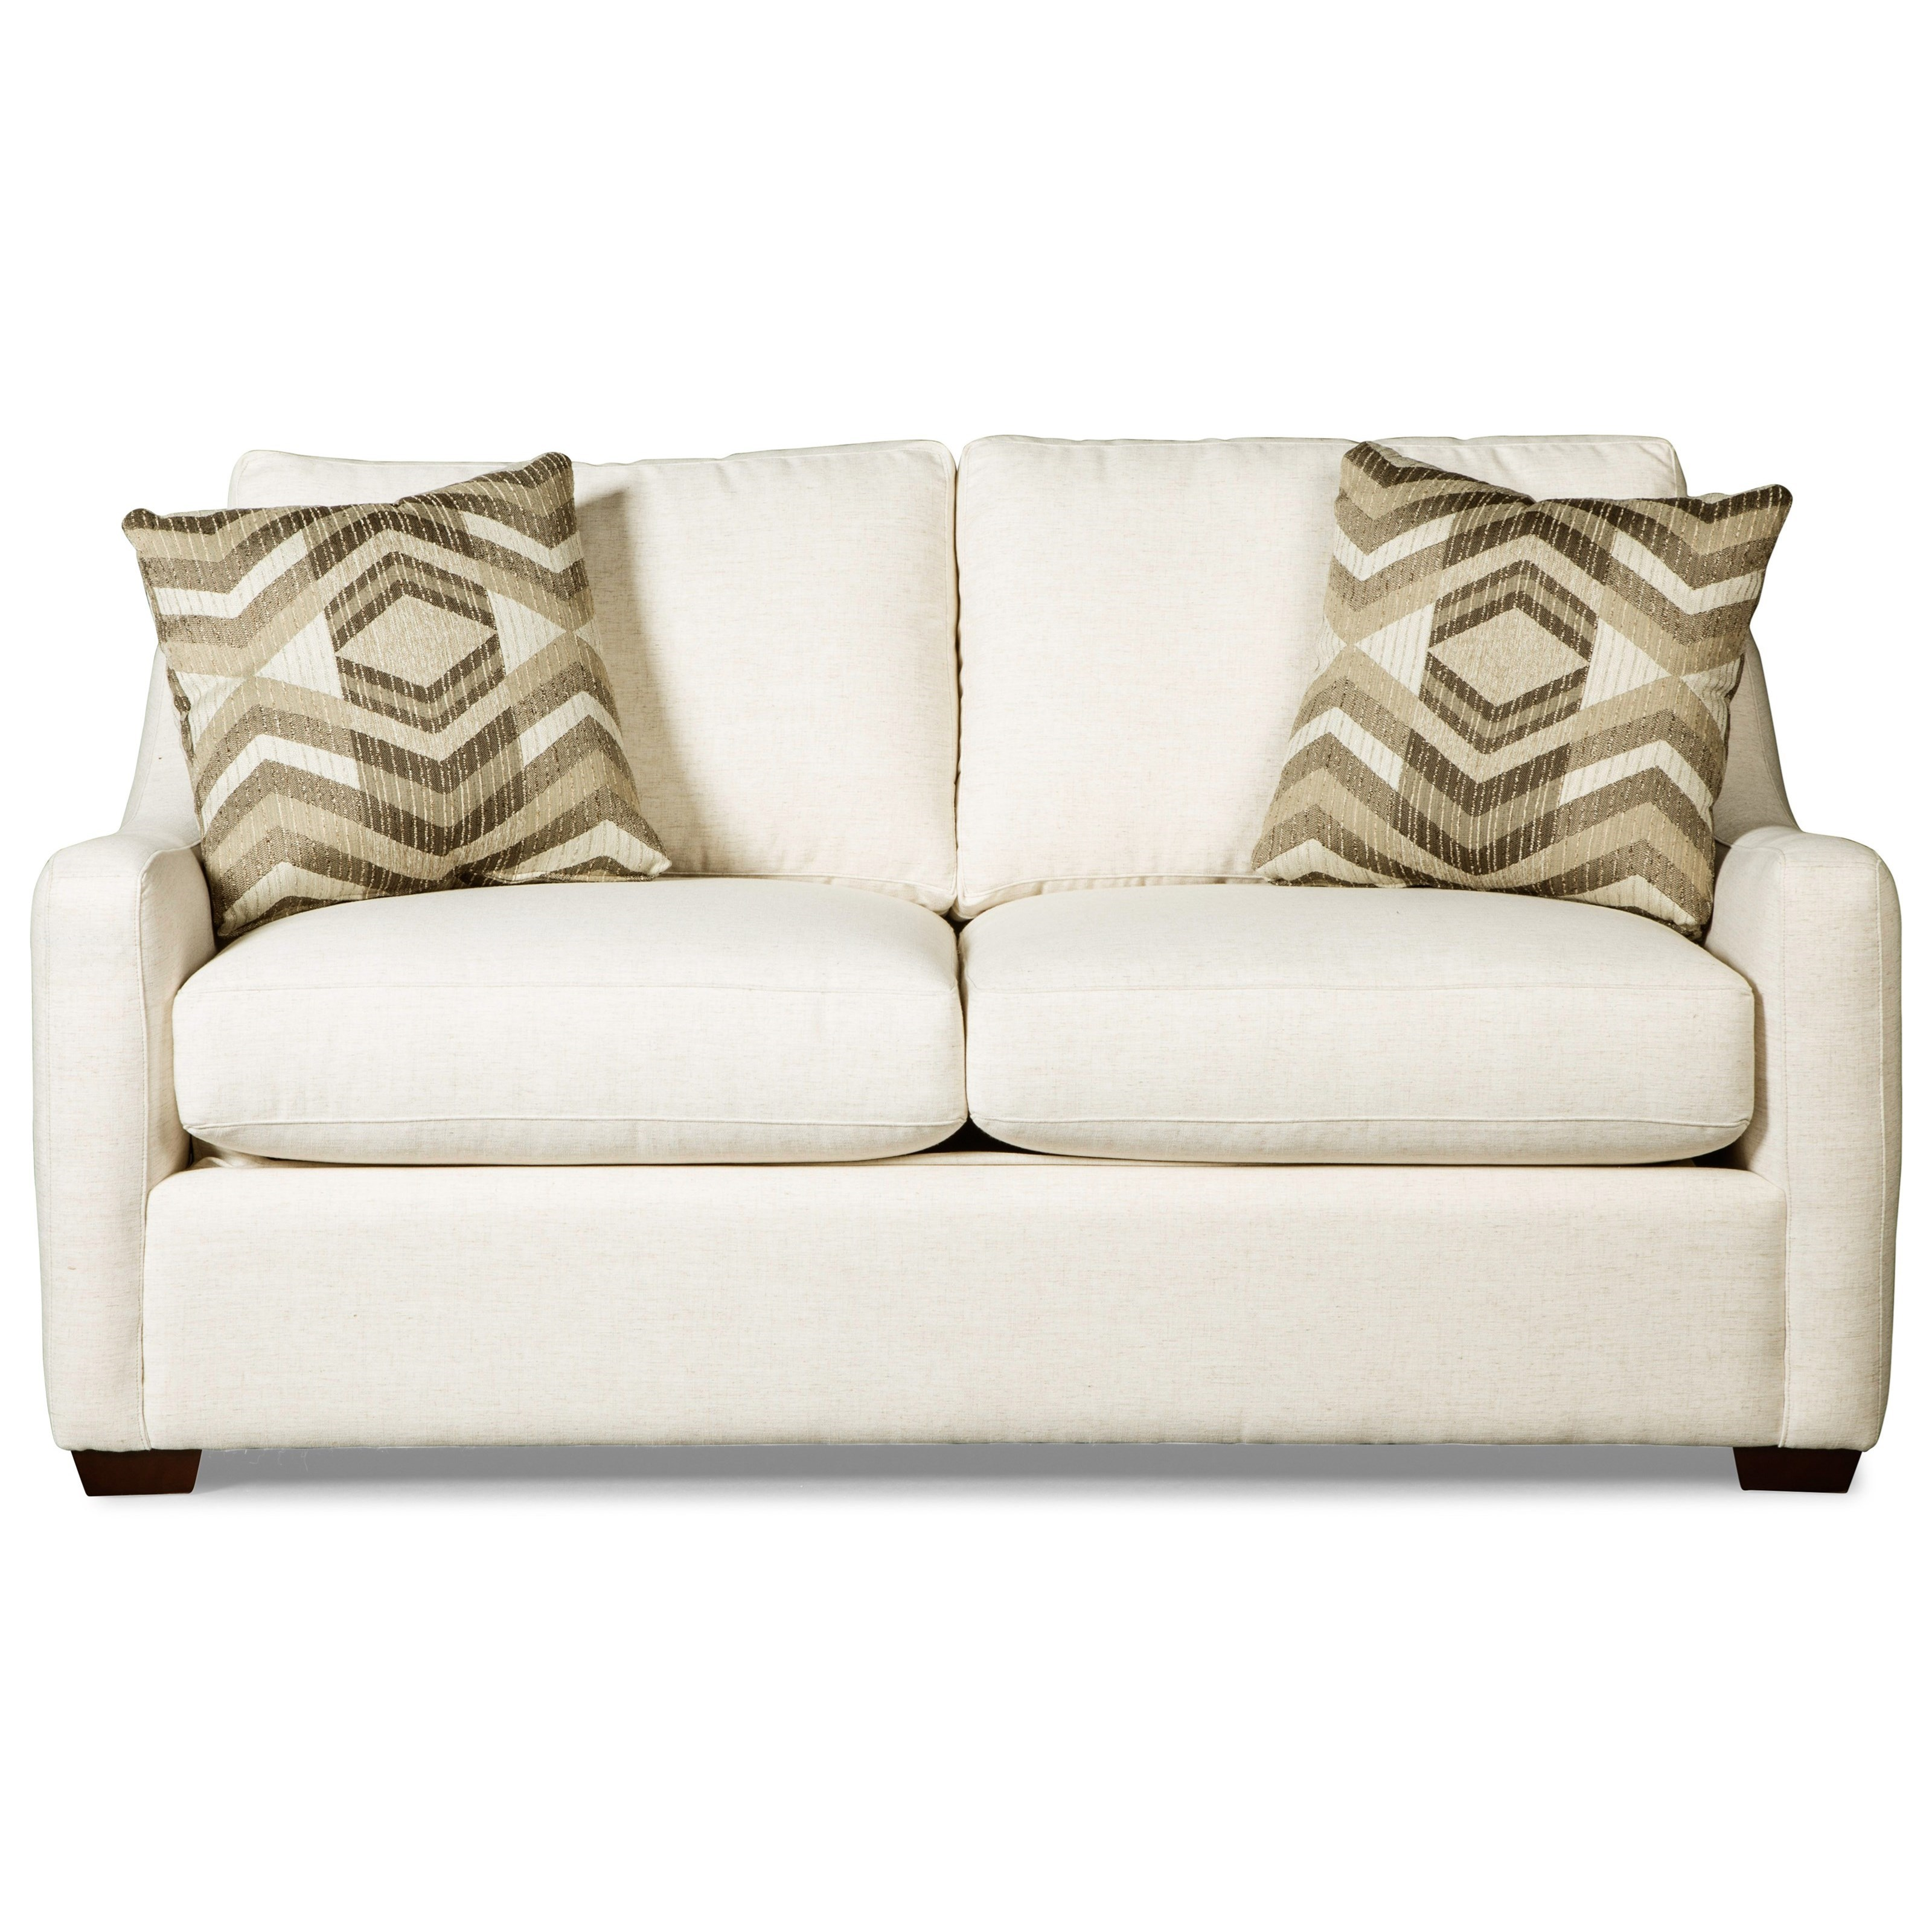 craftmaster 7643 full size sleeper sofa olinde 39 s furniture sofa sleeper. Black Bedroom Furniture Sets. Home Design Ideas